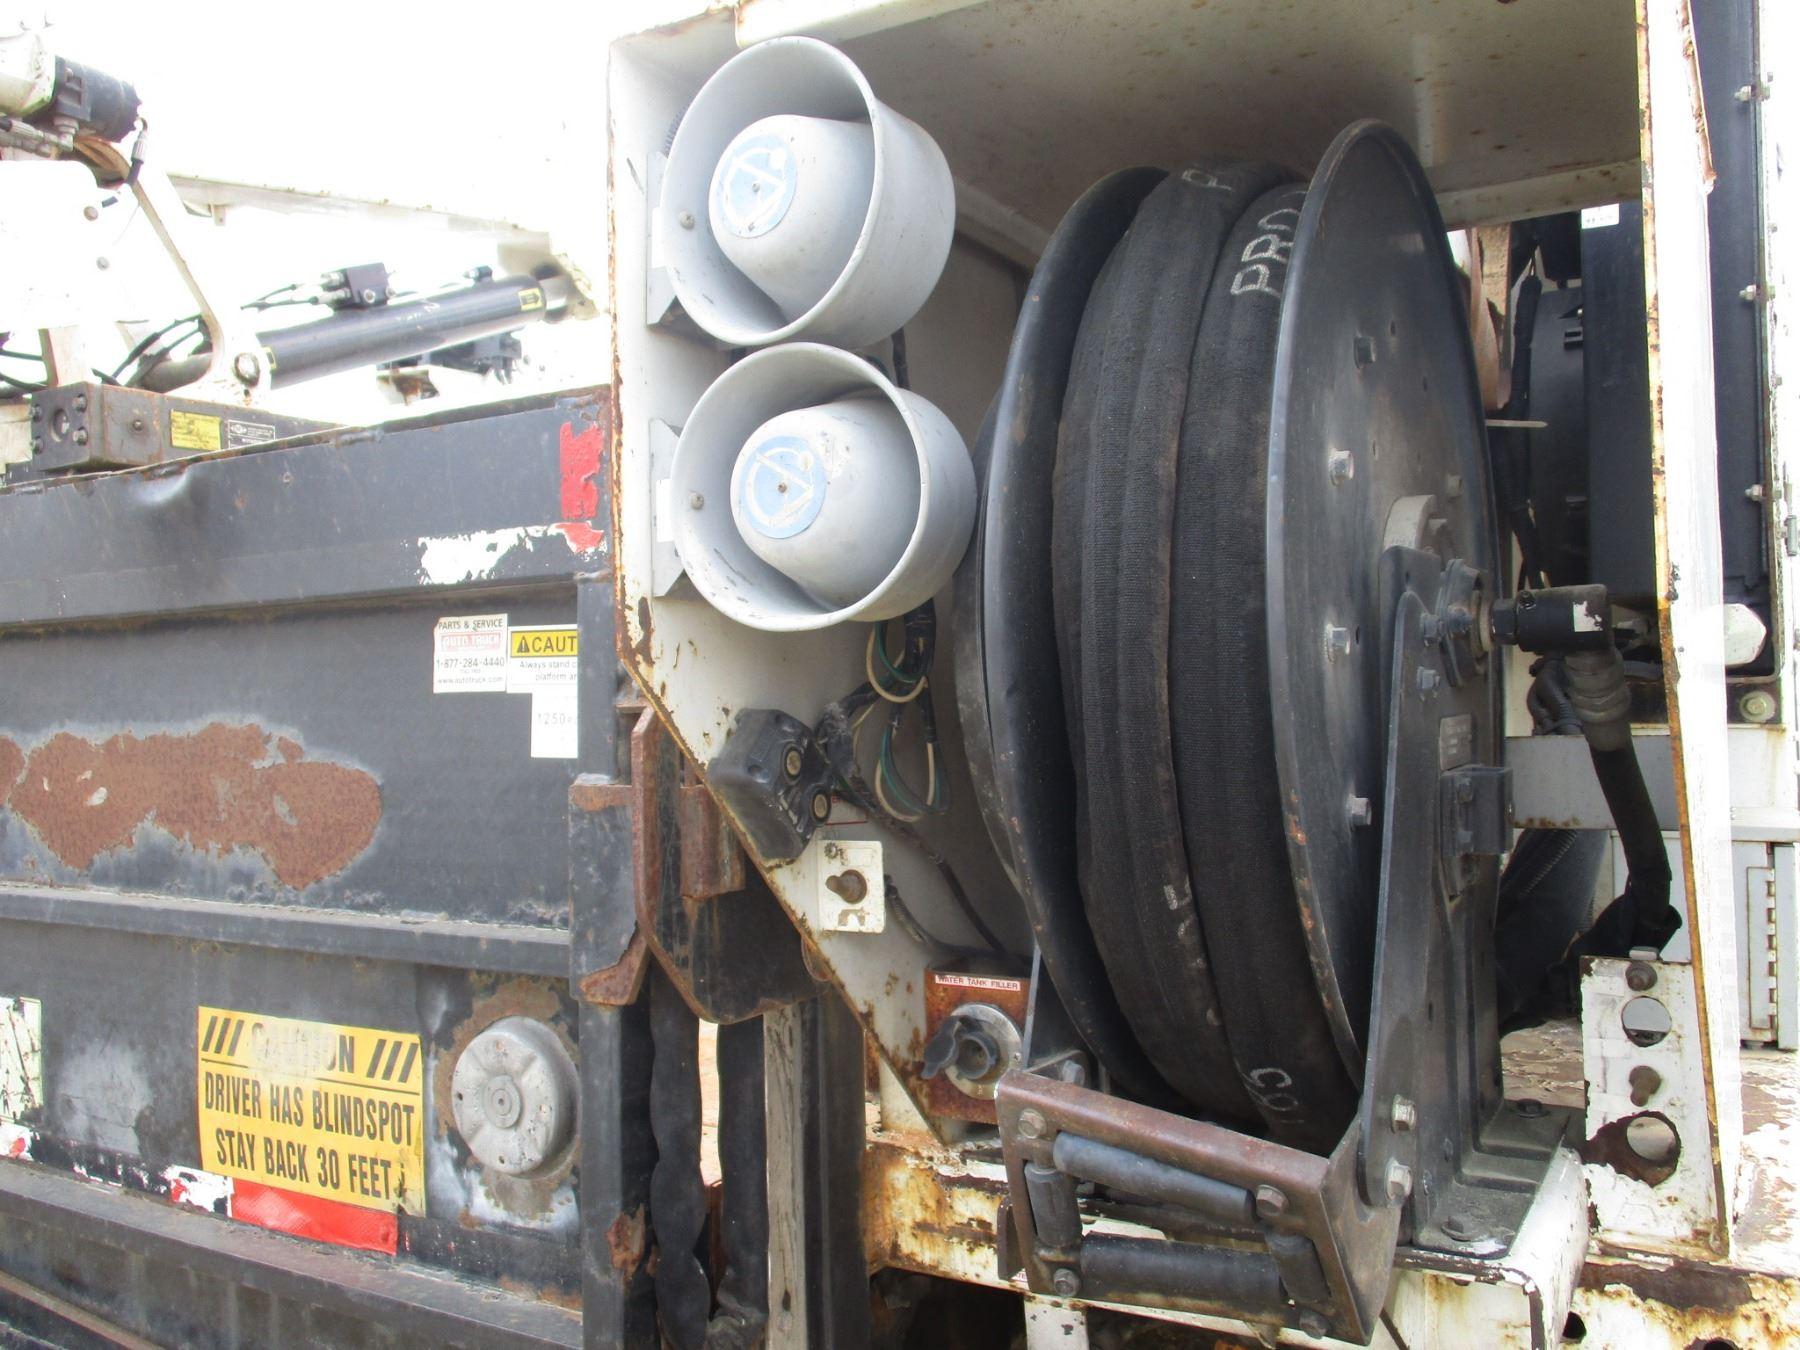 2010 FREIGHTLINER M2 SERVICE TRUCK, VIN/SN:1FUAC2BSXADAR3133 - S/A, EXT  CAB, ISC CUMMINS DIESEL ENGI